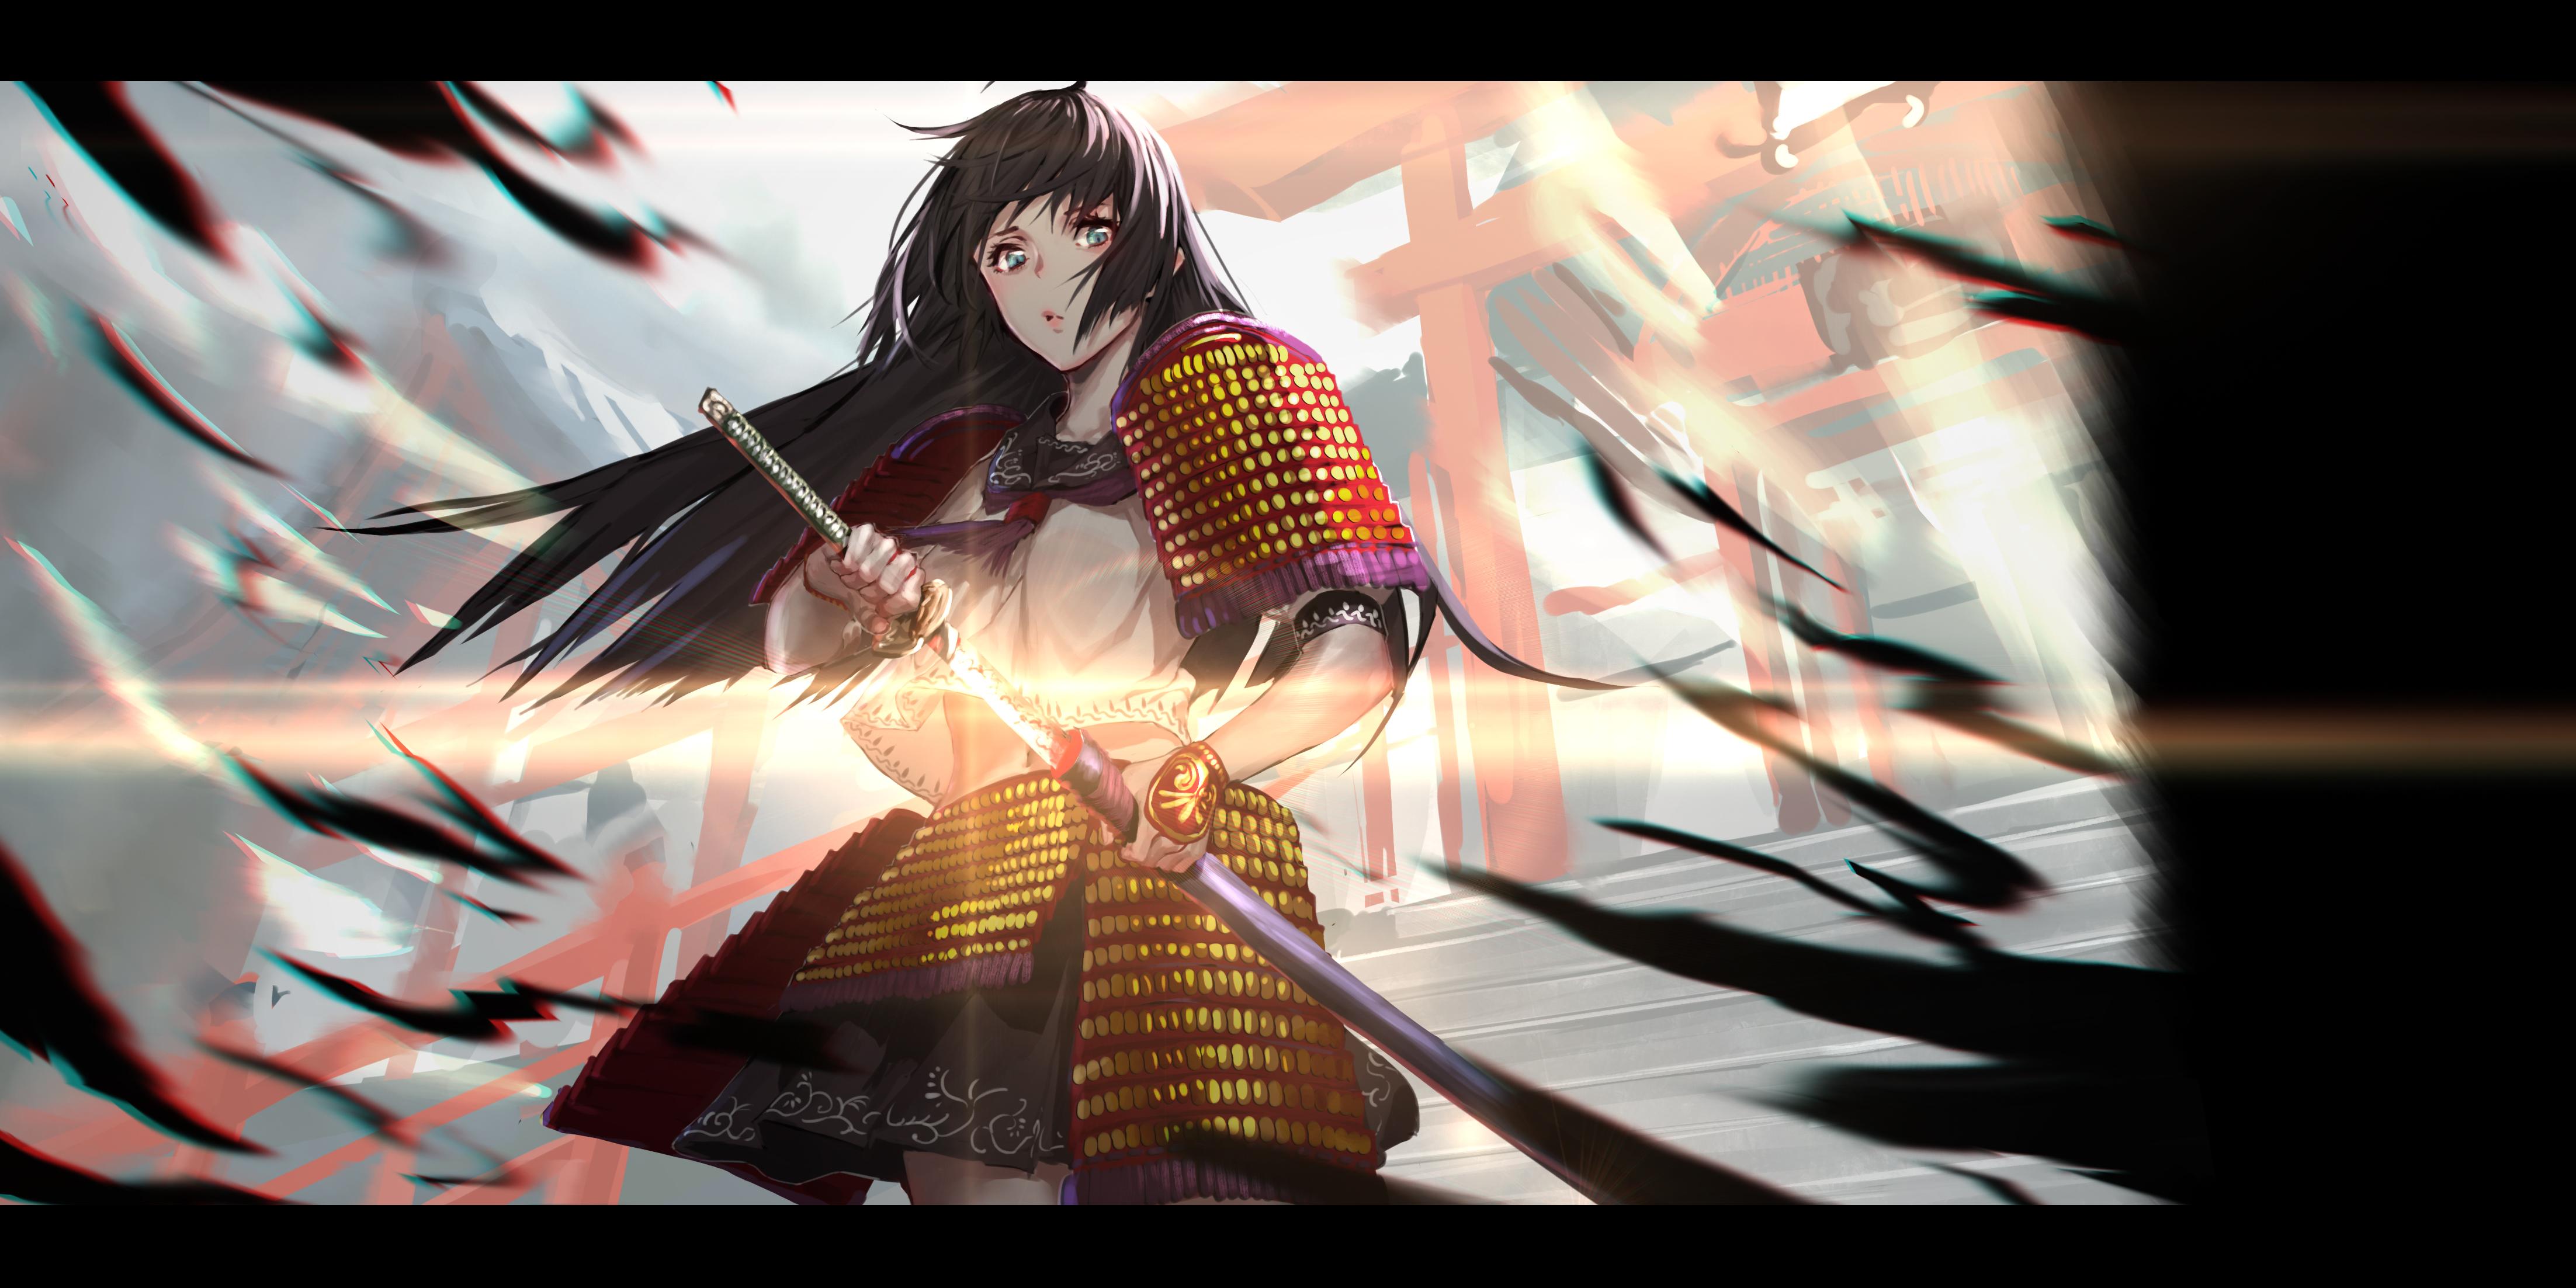 Anime 4409x2205 women black hair long hair sailor uniform schoolgirl artwork digital art fantasy art armor samurai katana windy fantasy girl warrior looking at viewer illustration 2D original characters Rolua Noa belly anime girls anime lens flare